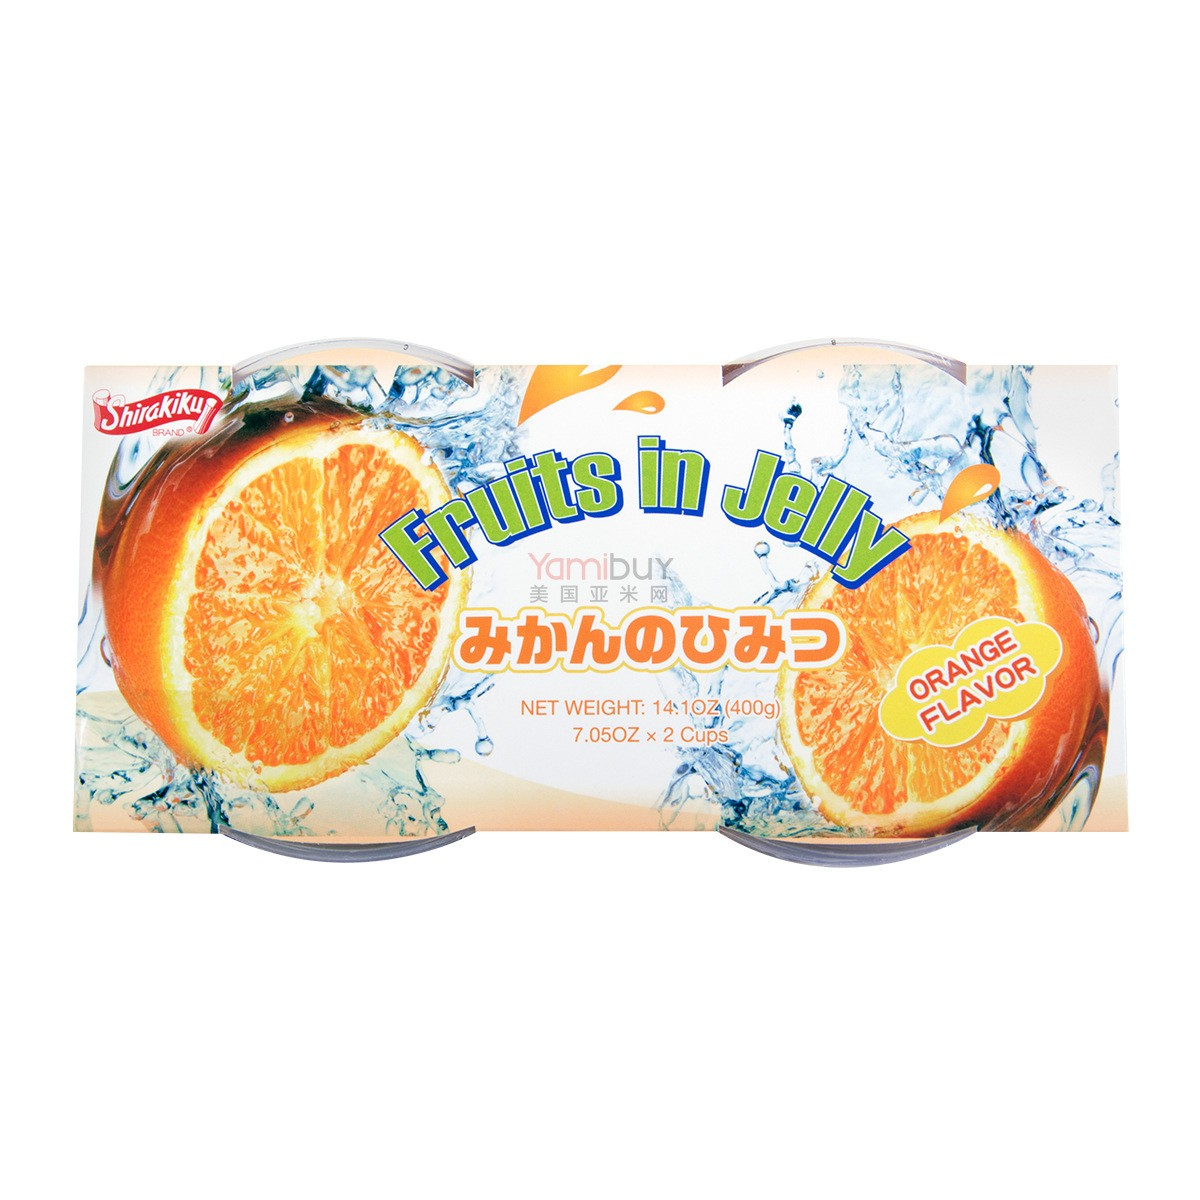 SHIRAKIKU Jelly Cup Orange Flavor 2 Cups 400g